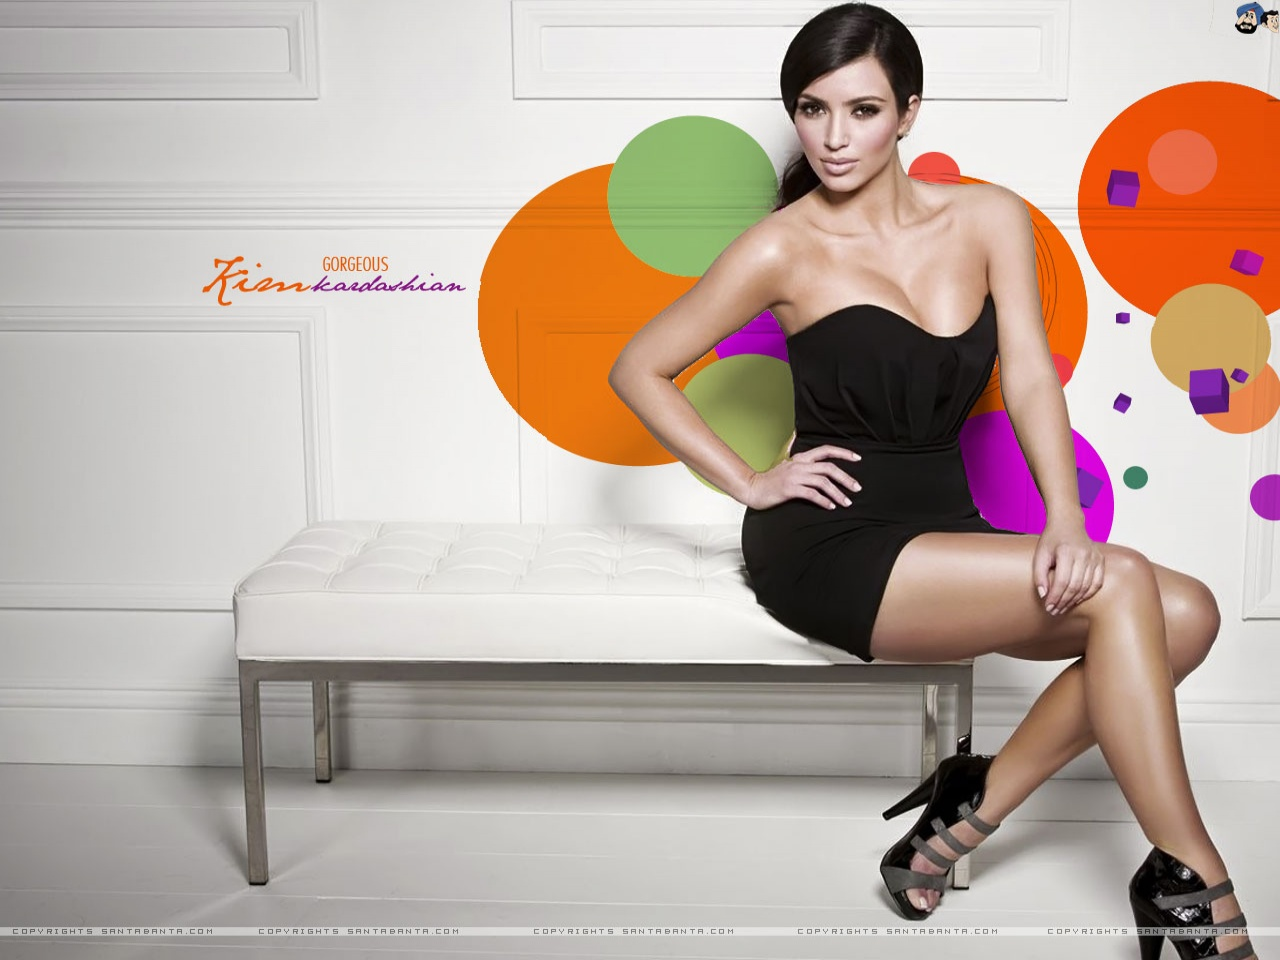 hot celebrities wallpapers 2012 Kim Kardashian Hot Wallpaper 2012 1280x960